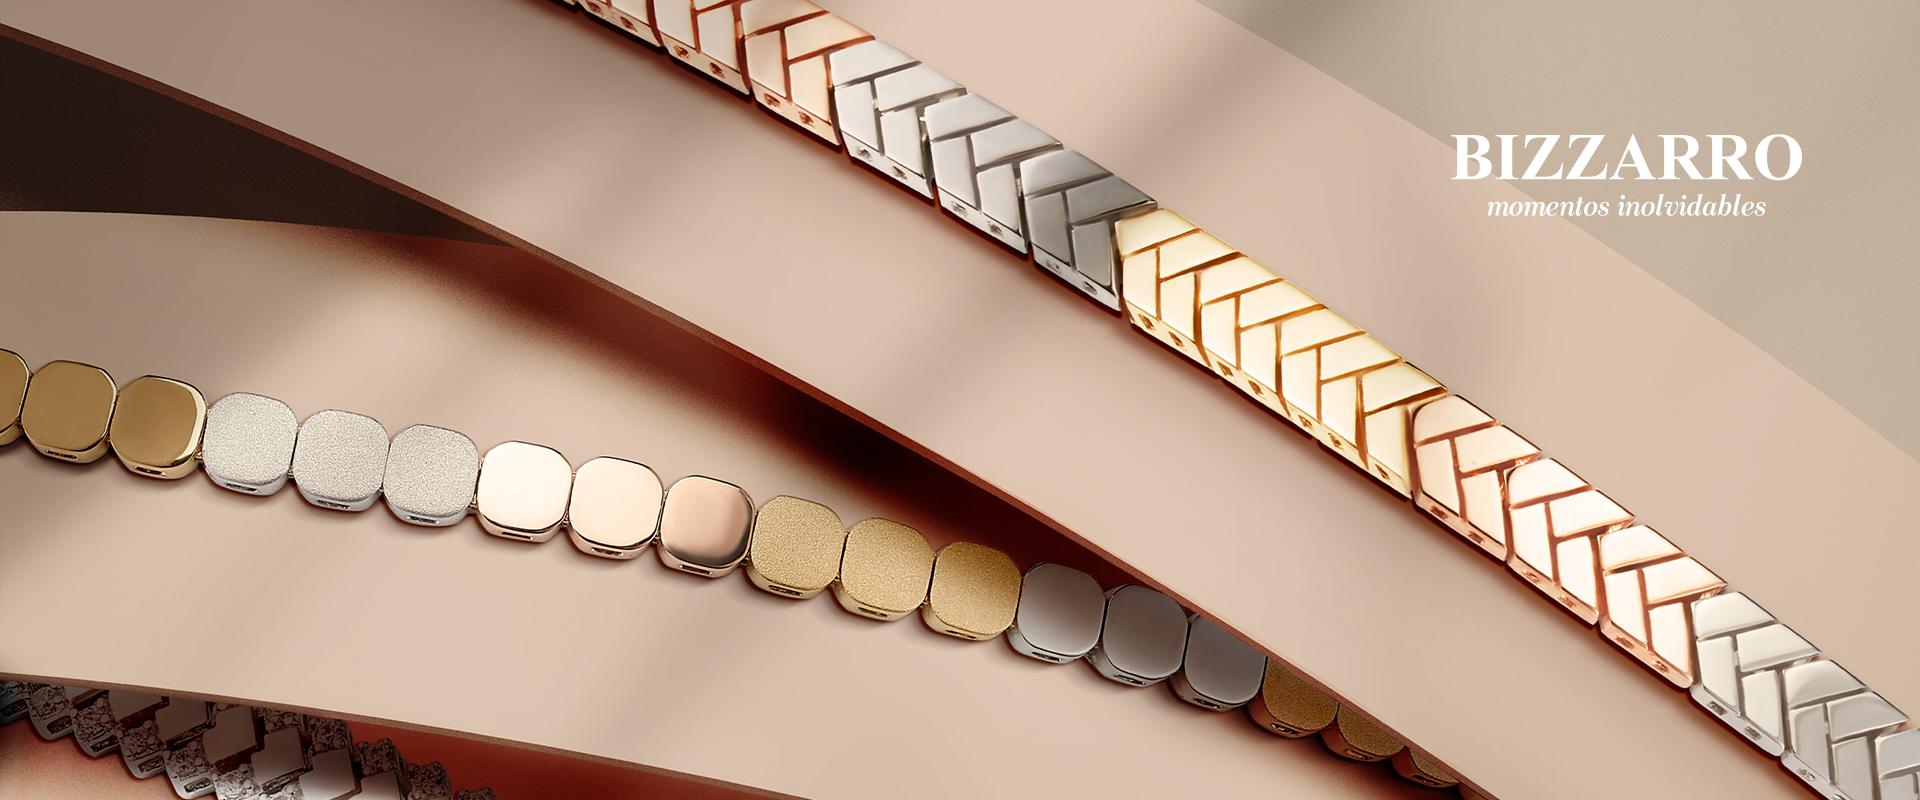 "Tips para combinar un look veraniego con joyas que trazan ""Líneas de perfección"""